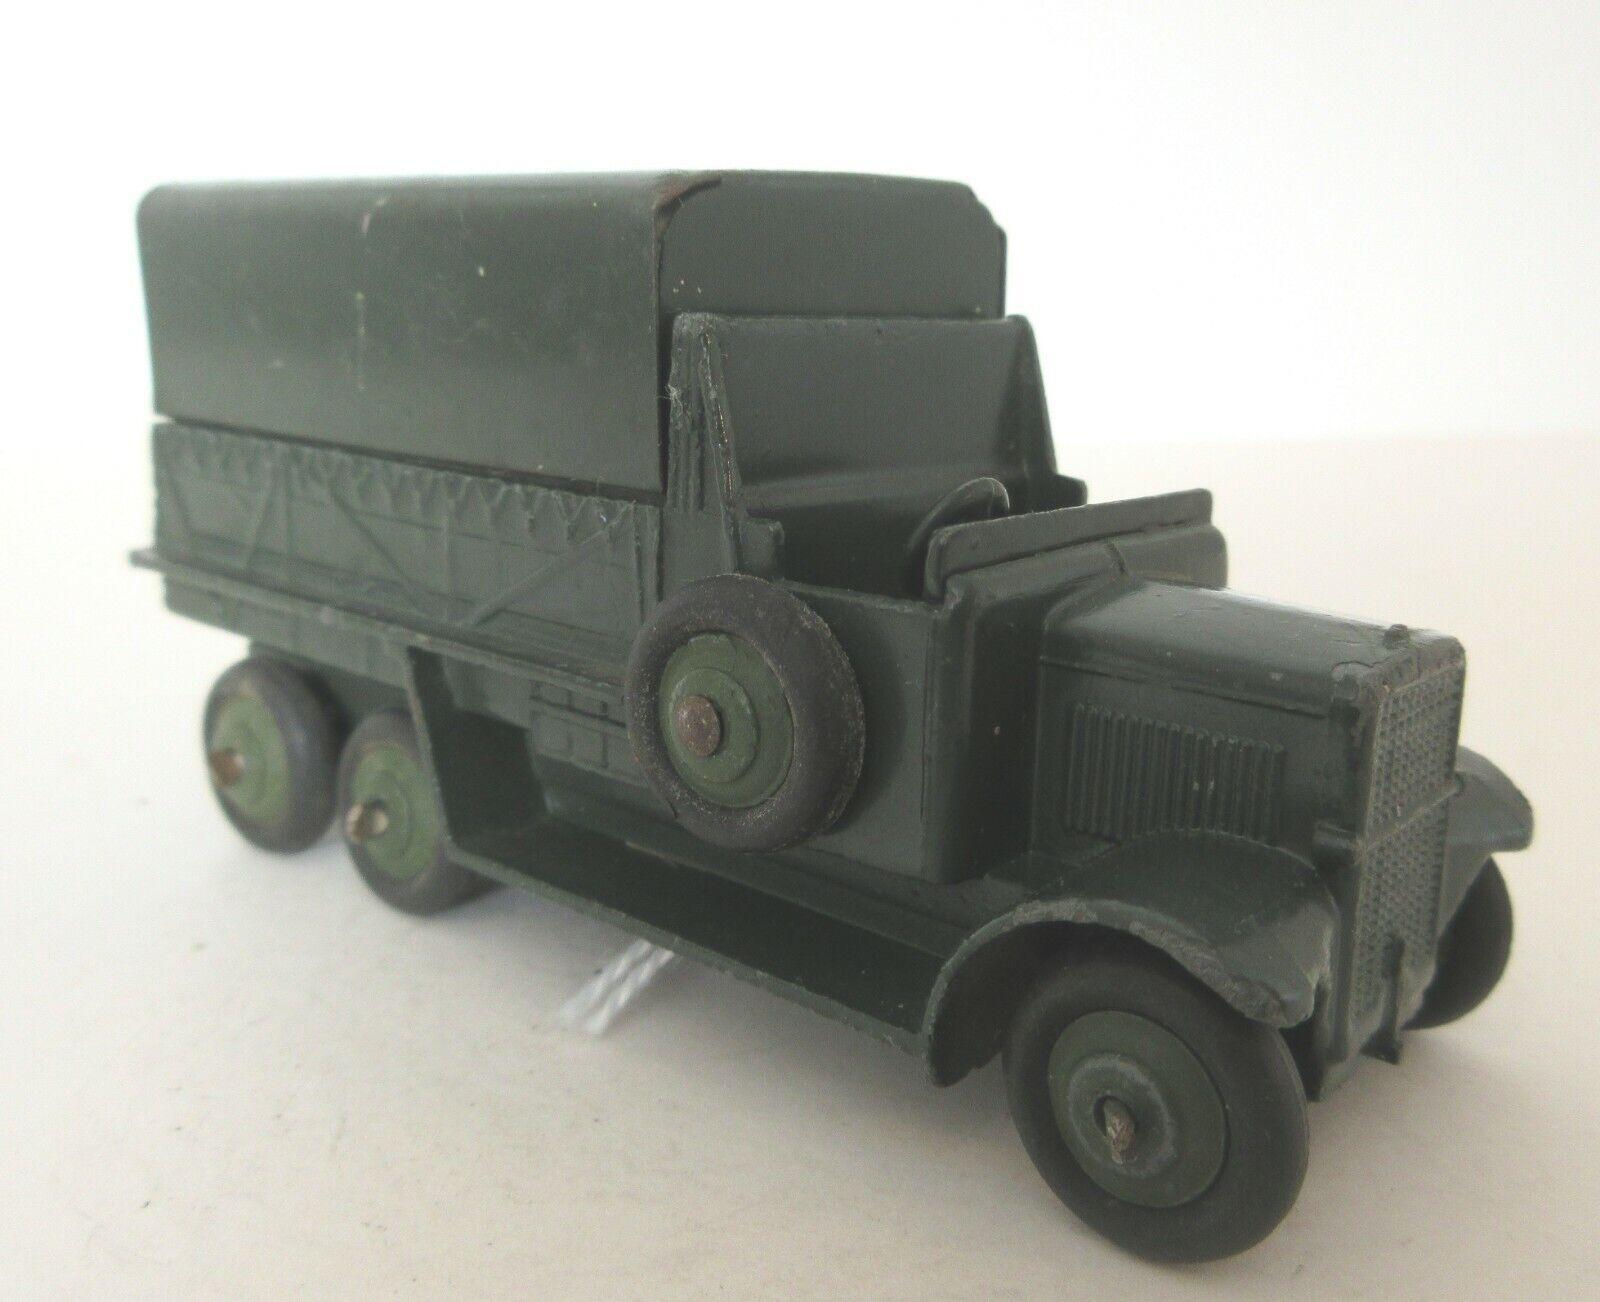 Dinky Juguetes Ejército Militar 6 ruedas vagón cubierto Dinky Juguetes Militar Modelos (2)